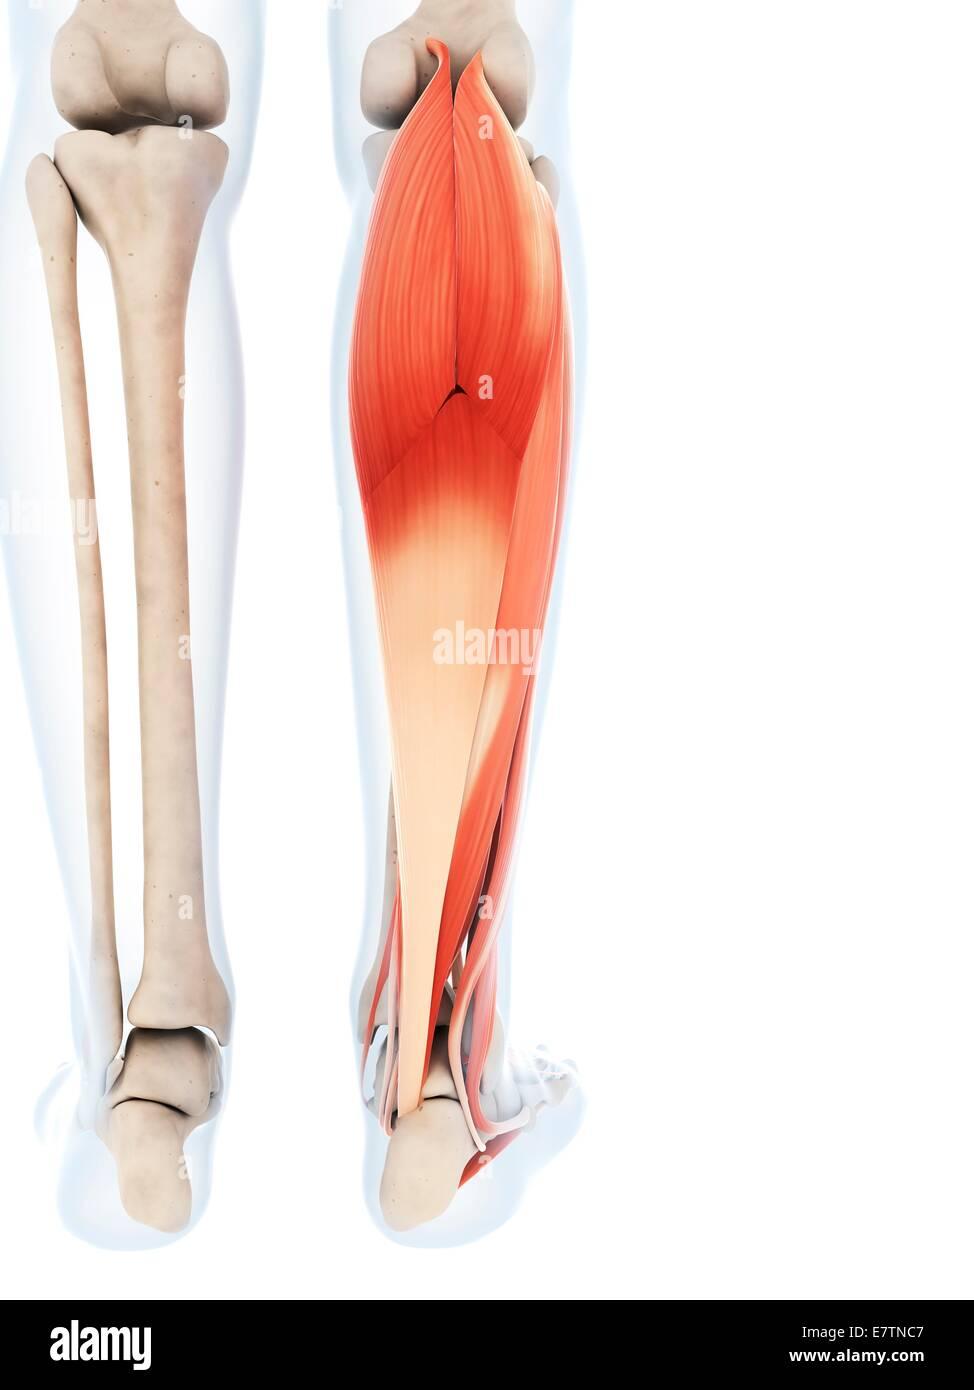 Human calf muscles, computer artwork Stock Photo: 73687719 - Alamy